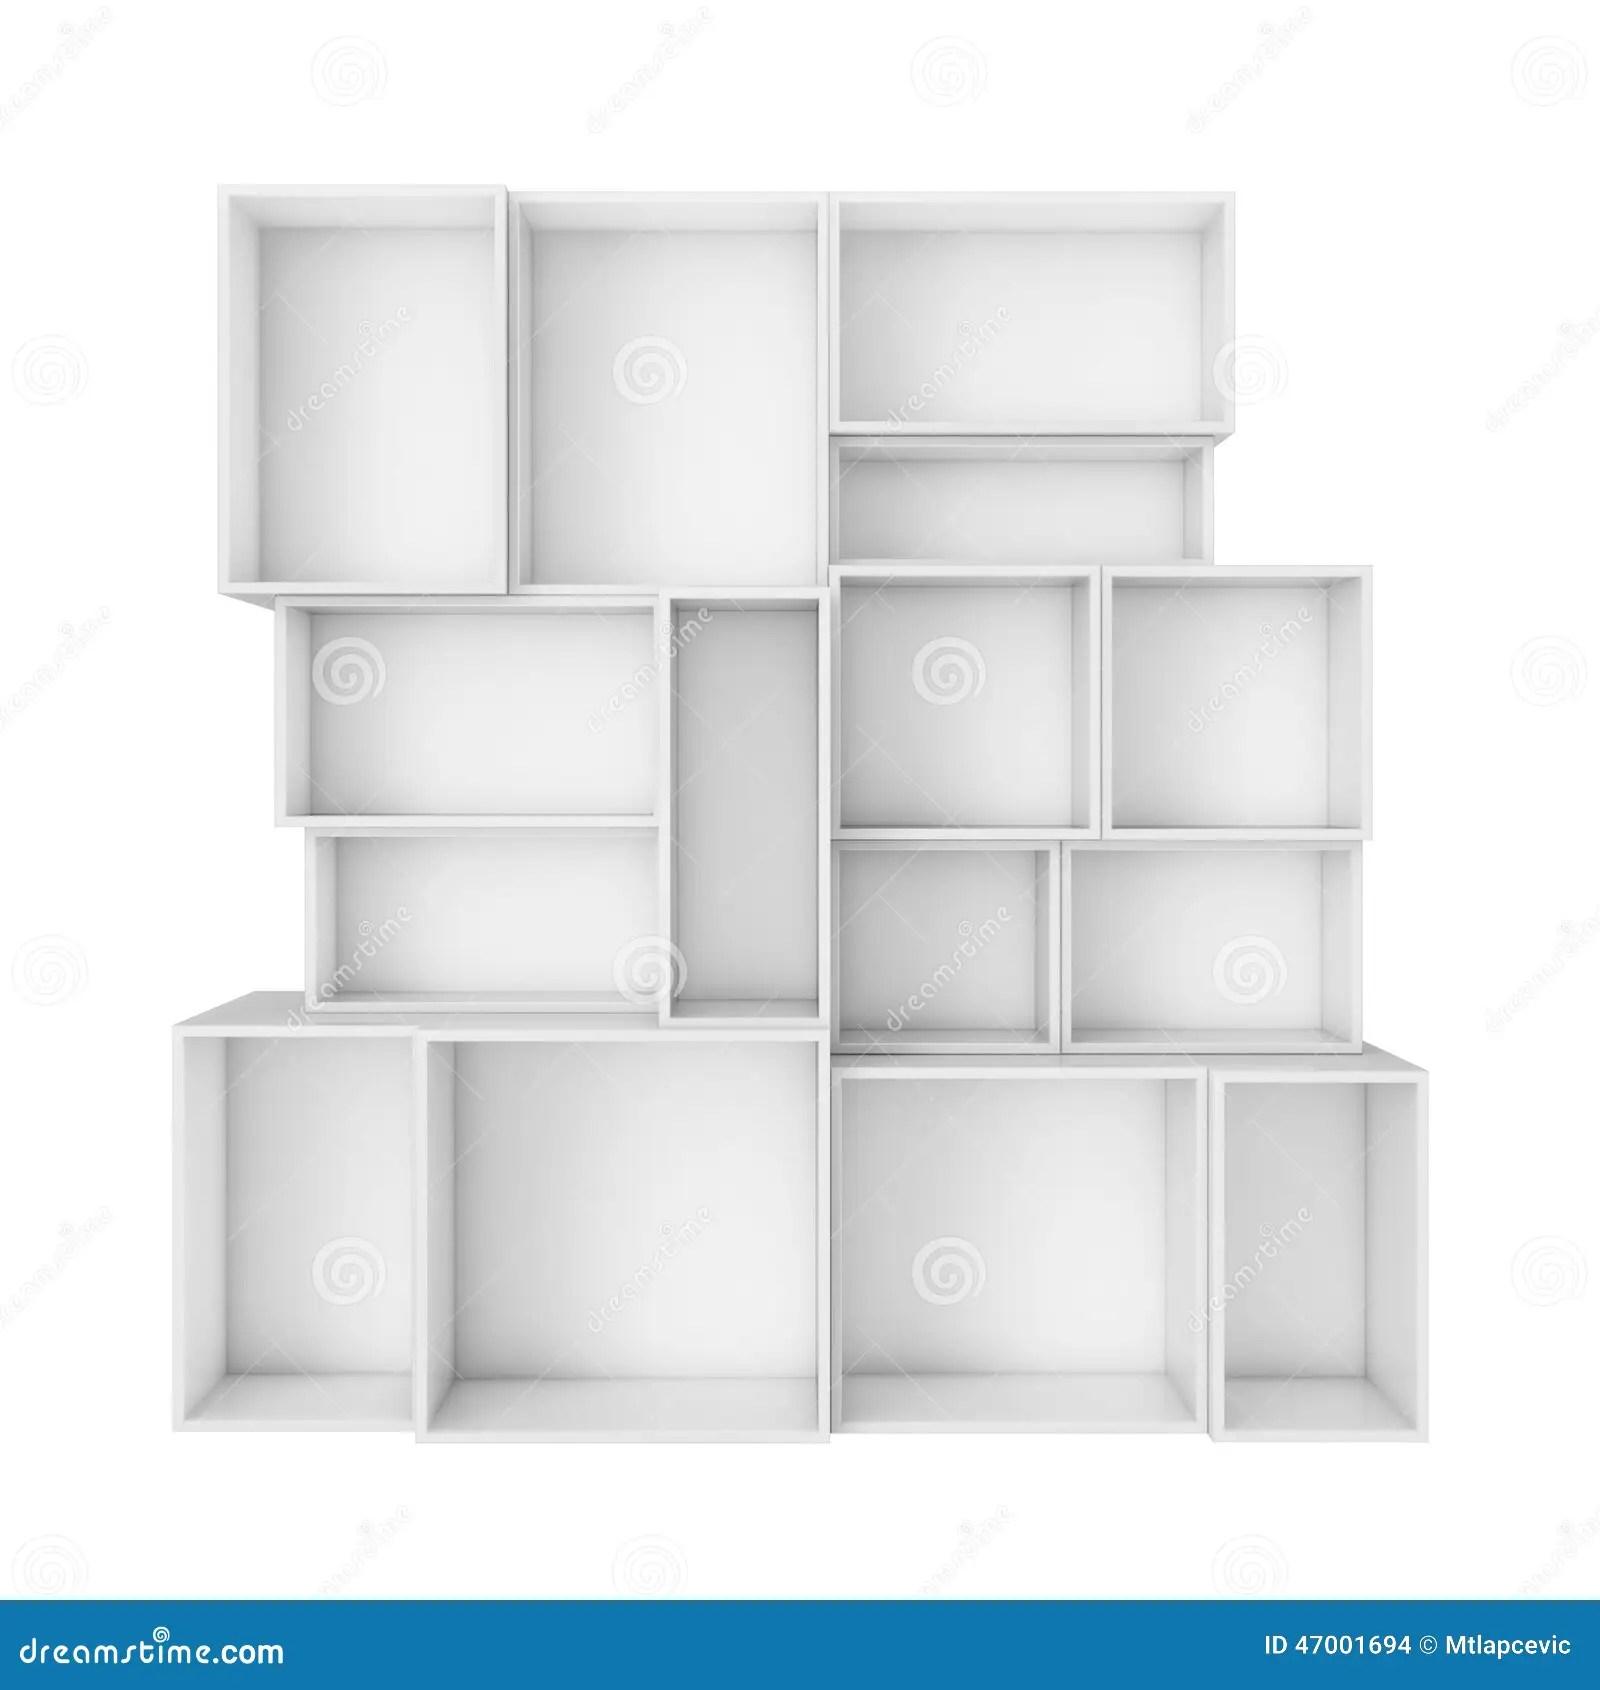 3d Shelves Wallpaper Empty Abstract White Shelves Isolated On White Background